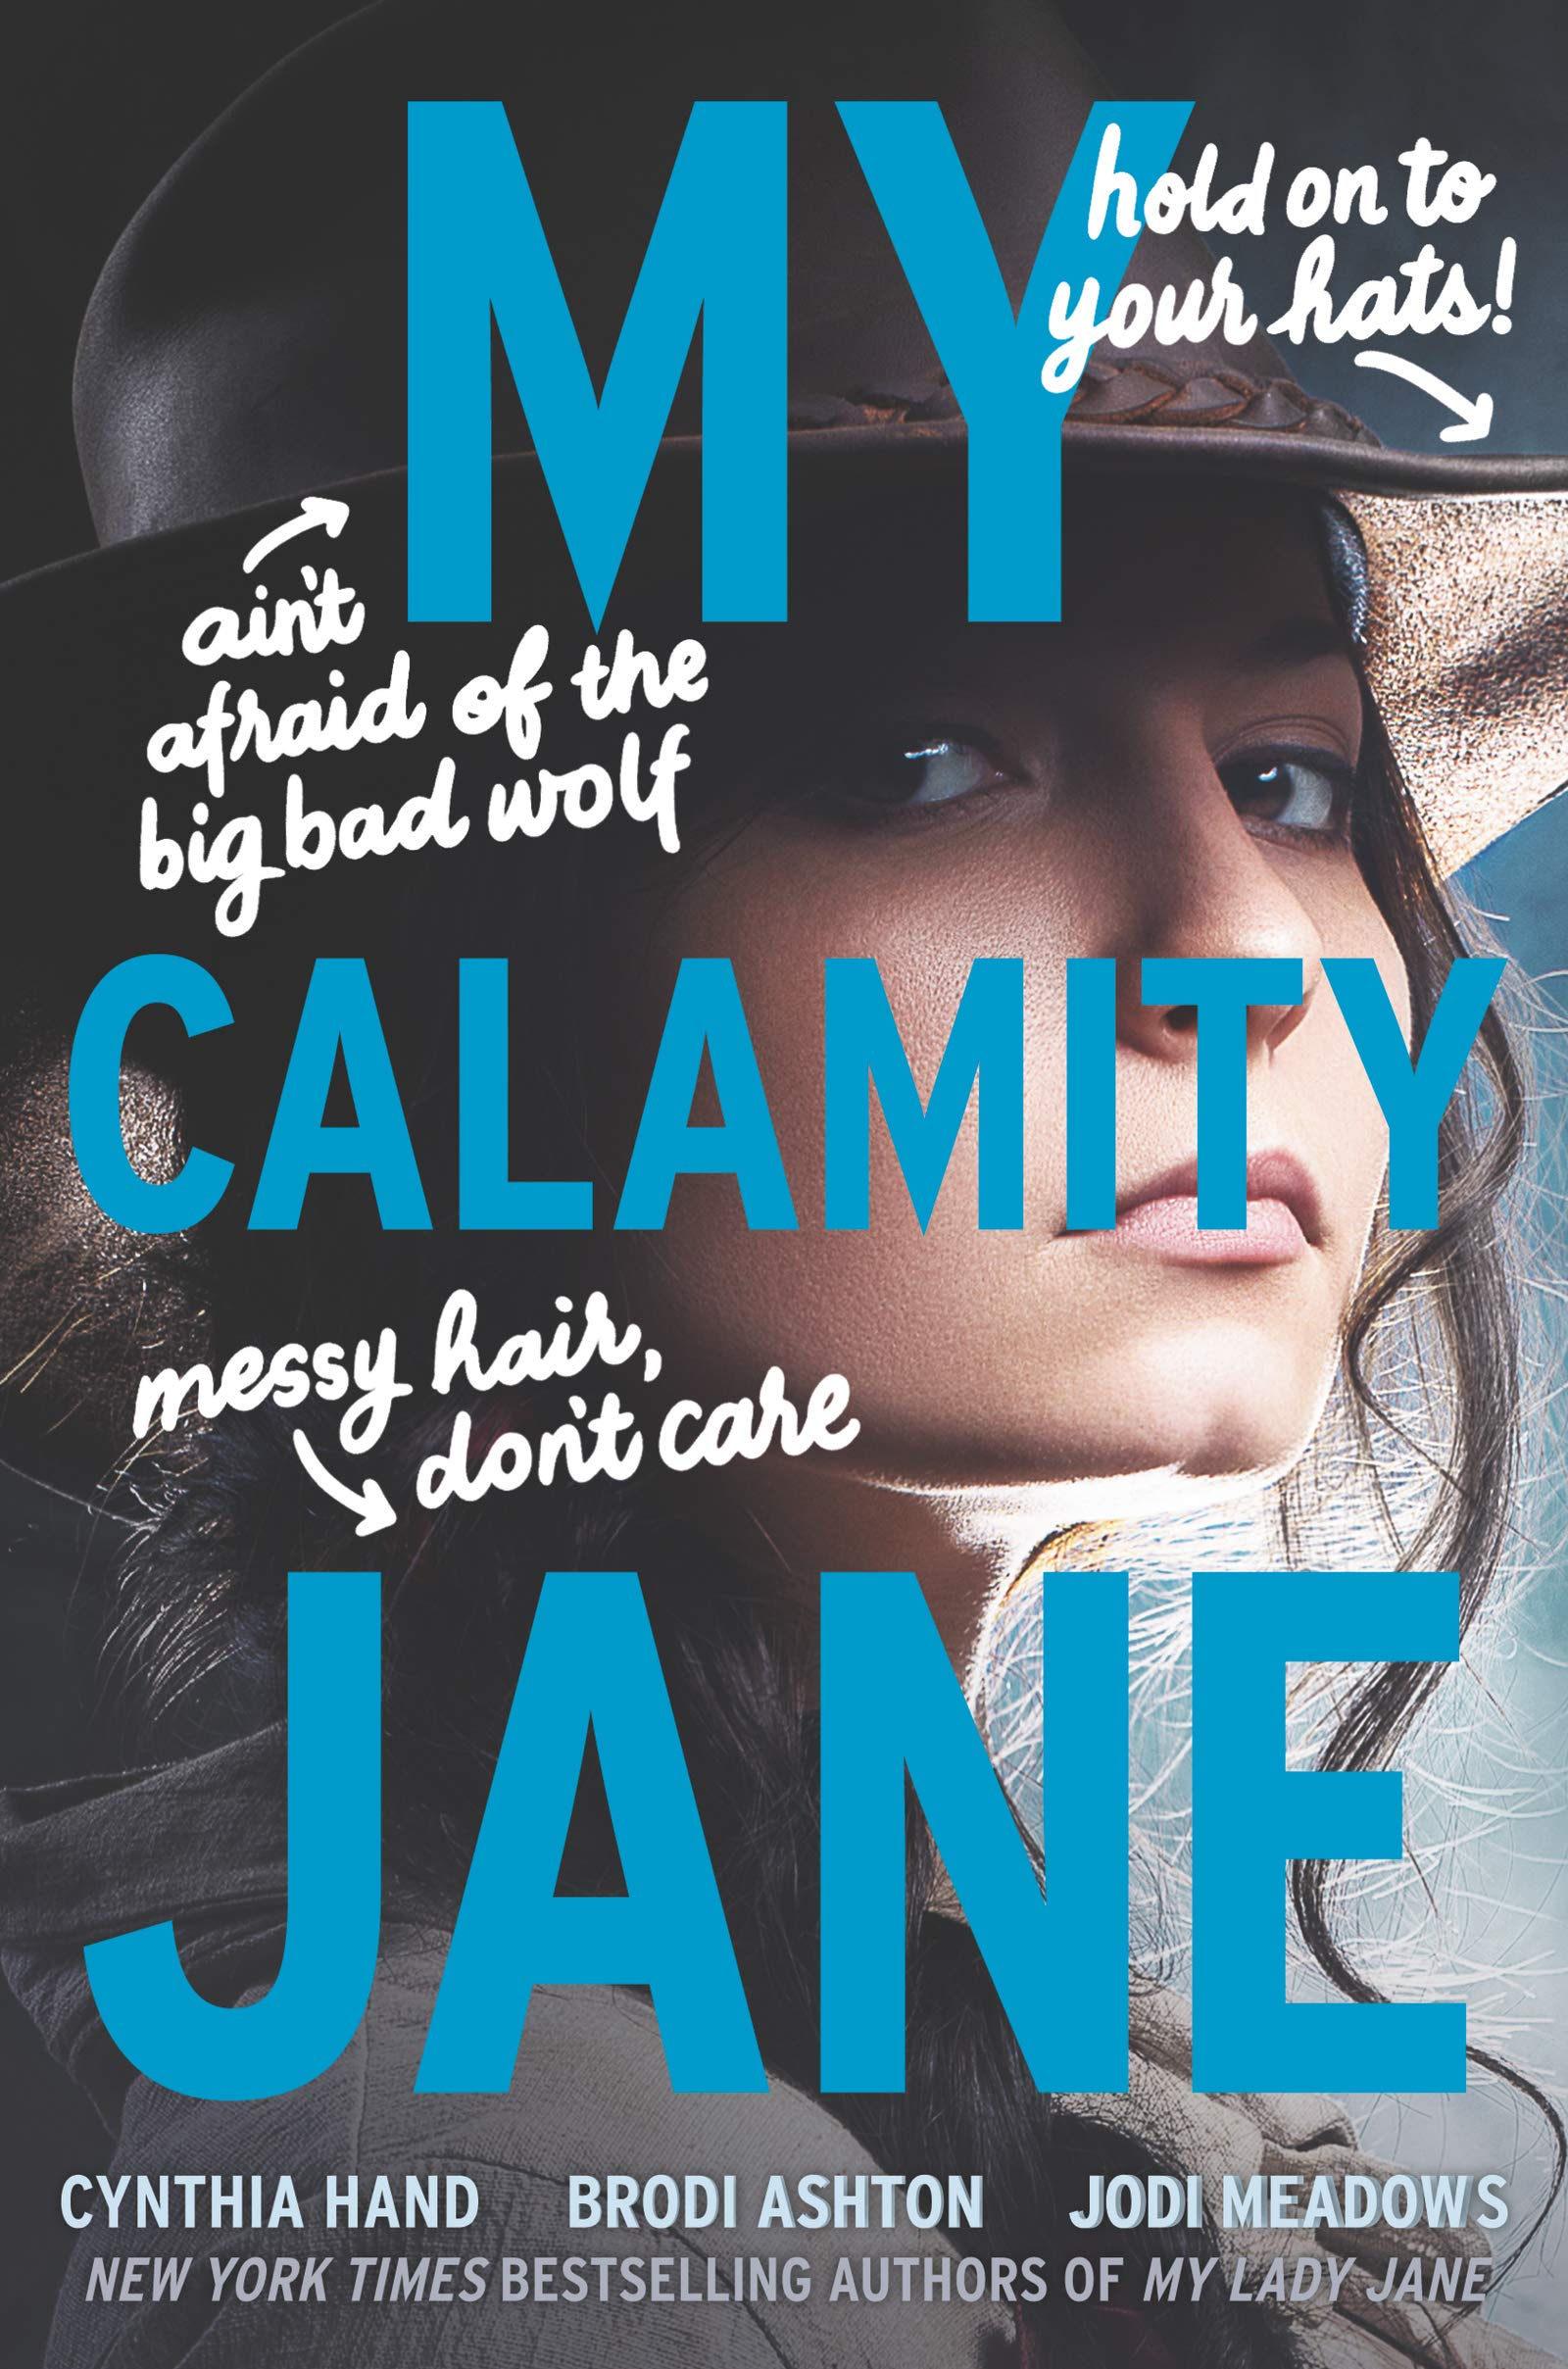 Amazon.com: My Calamity Jane (9780062652812): Hand, Cynthia ...